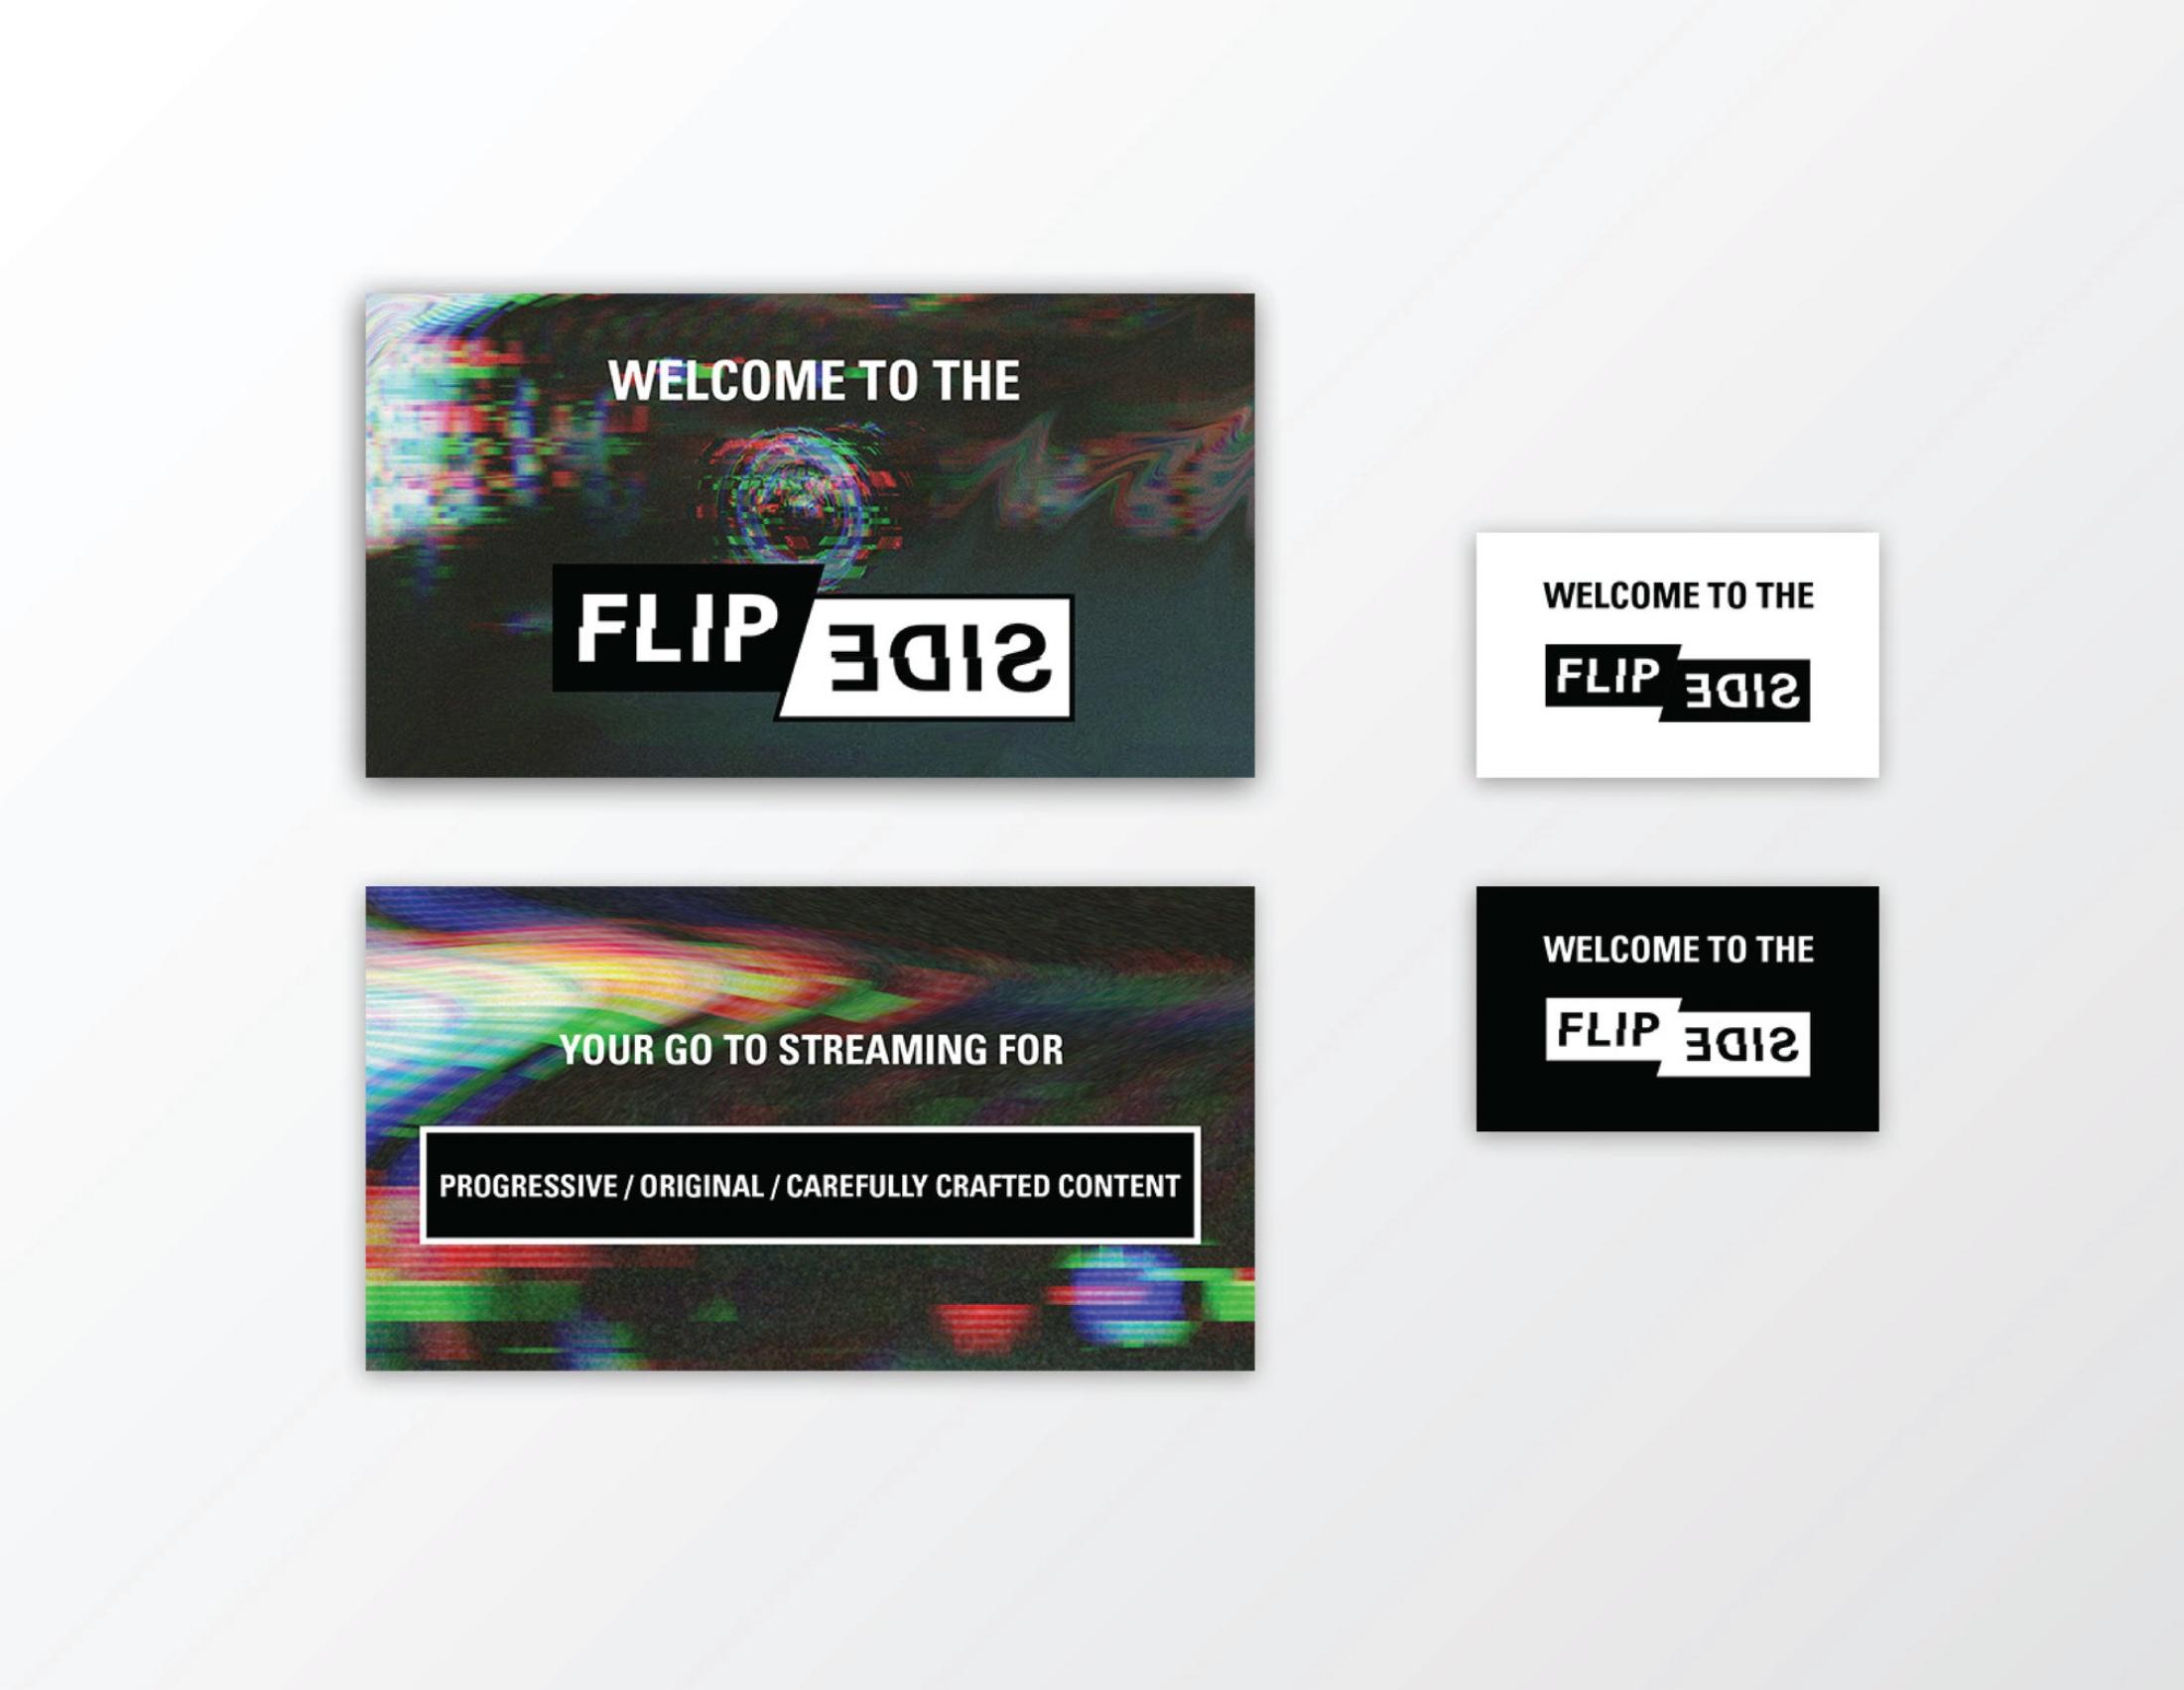 FlipSide-31.jpg